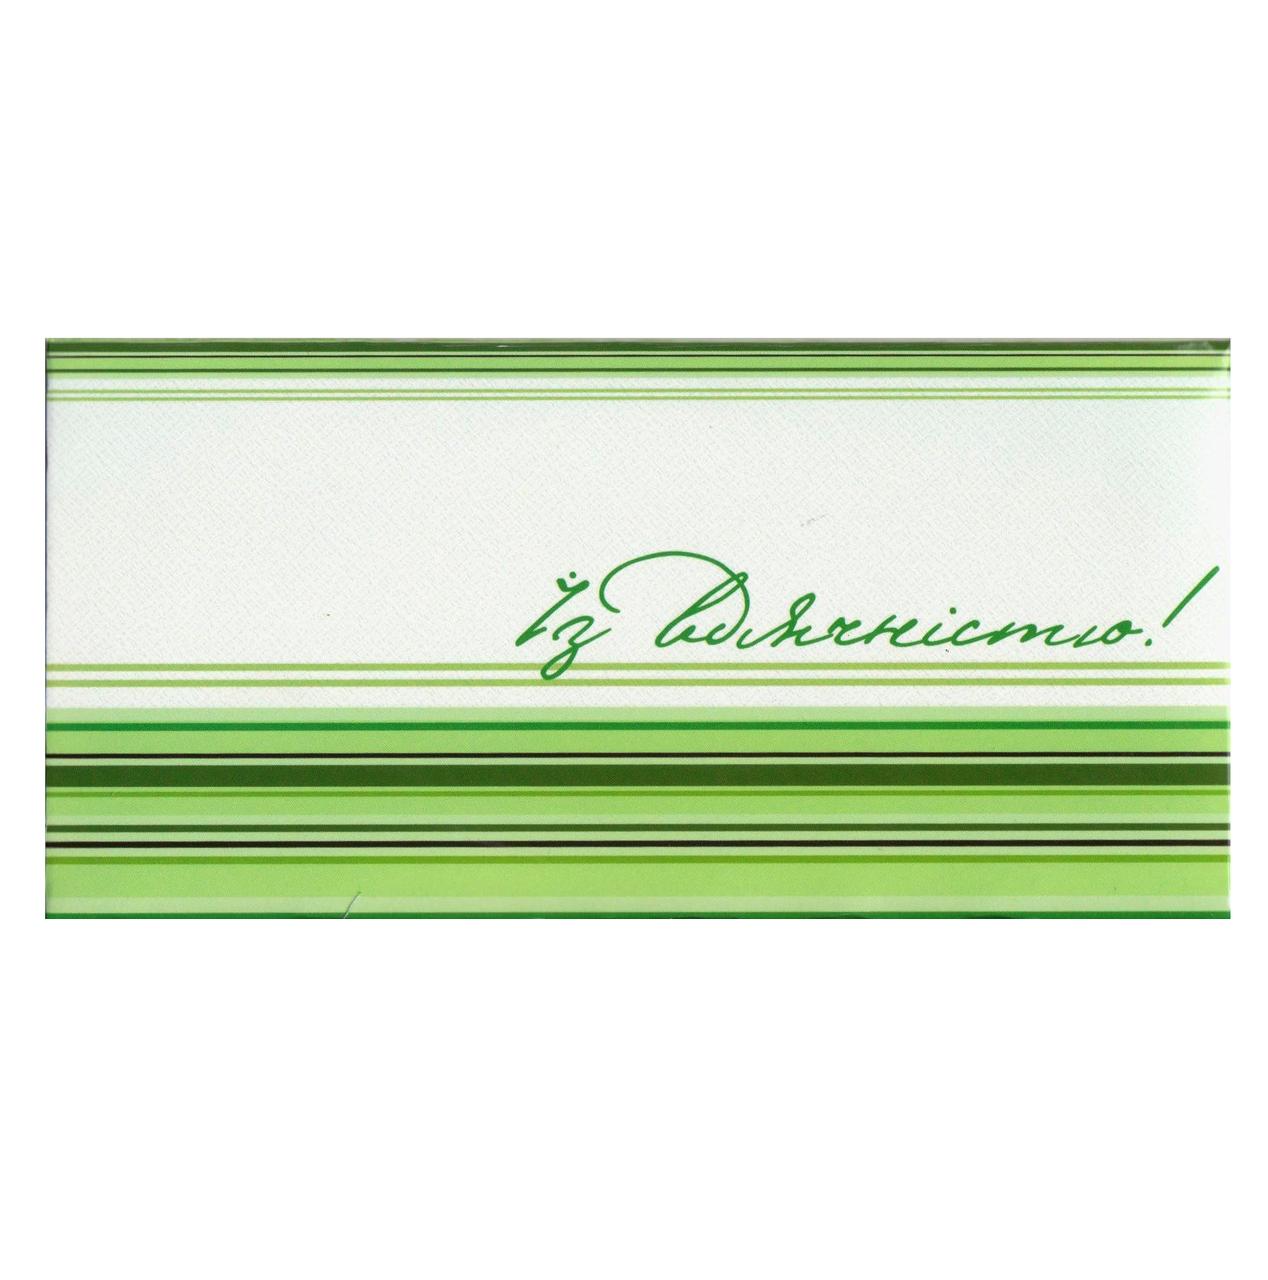 "Открытка - конверт для вложения денег ""Із вдячністю!"""